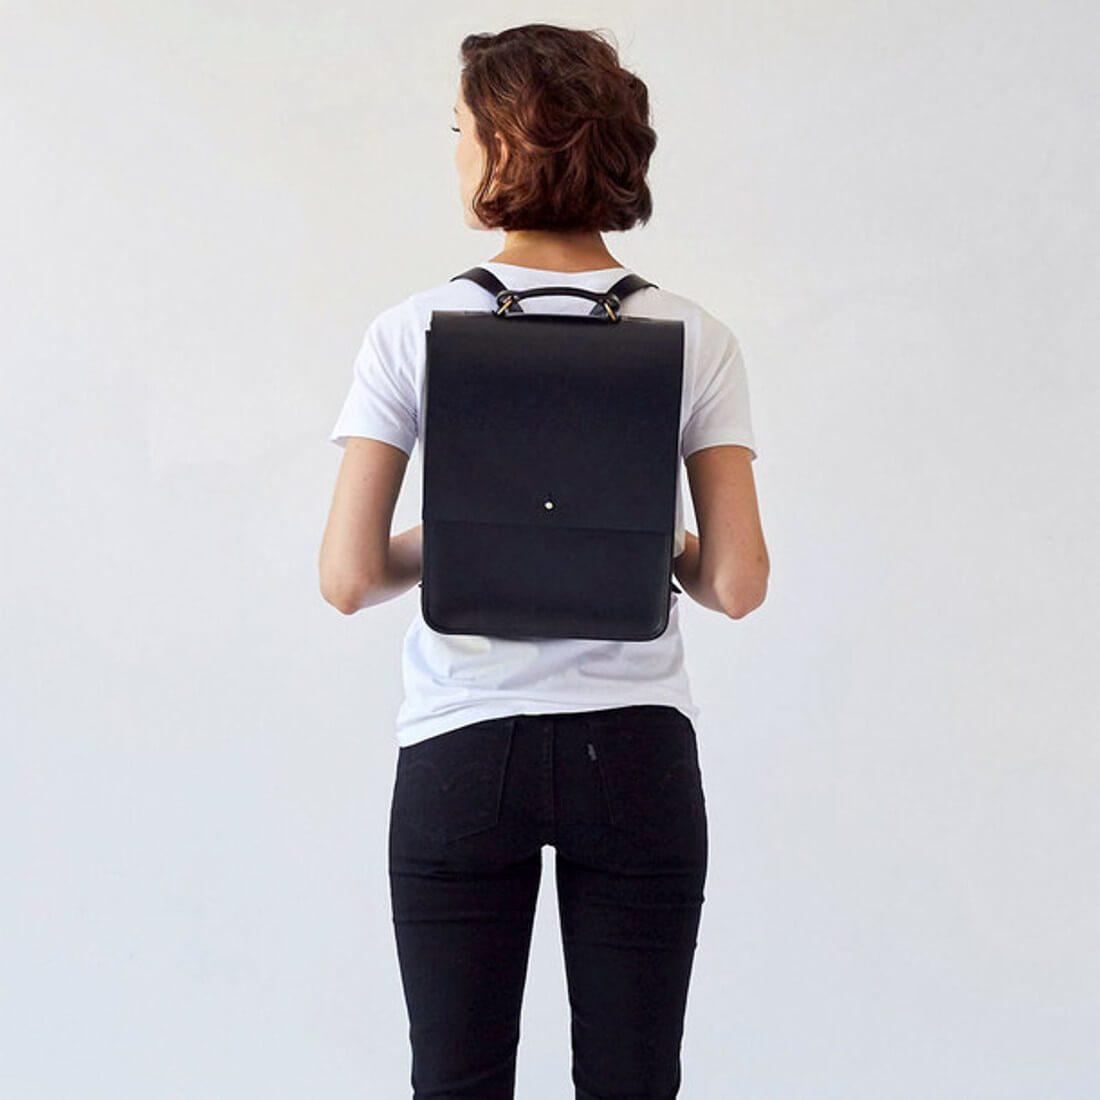 gracegordon-emma-backpack-leather-black-context2-image610x610-crop-2-2